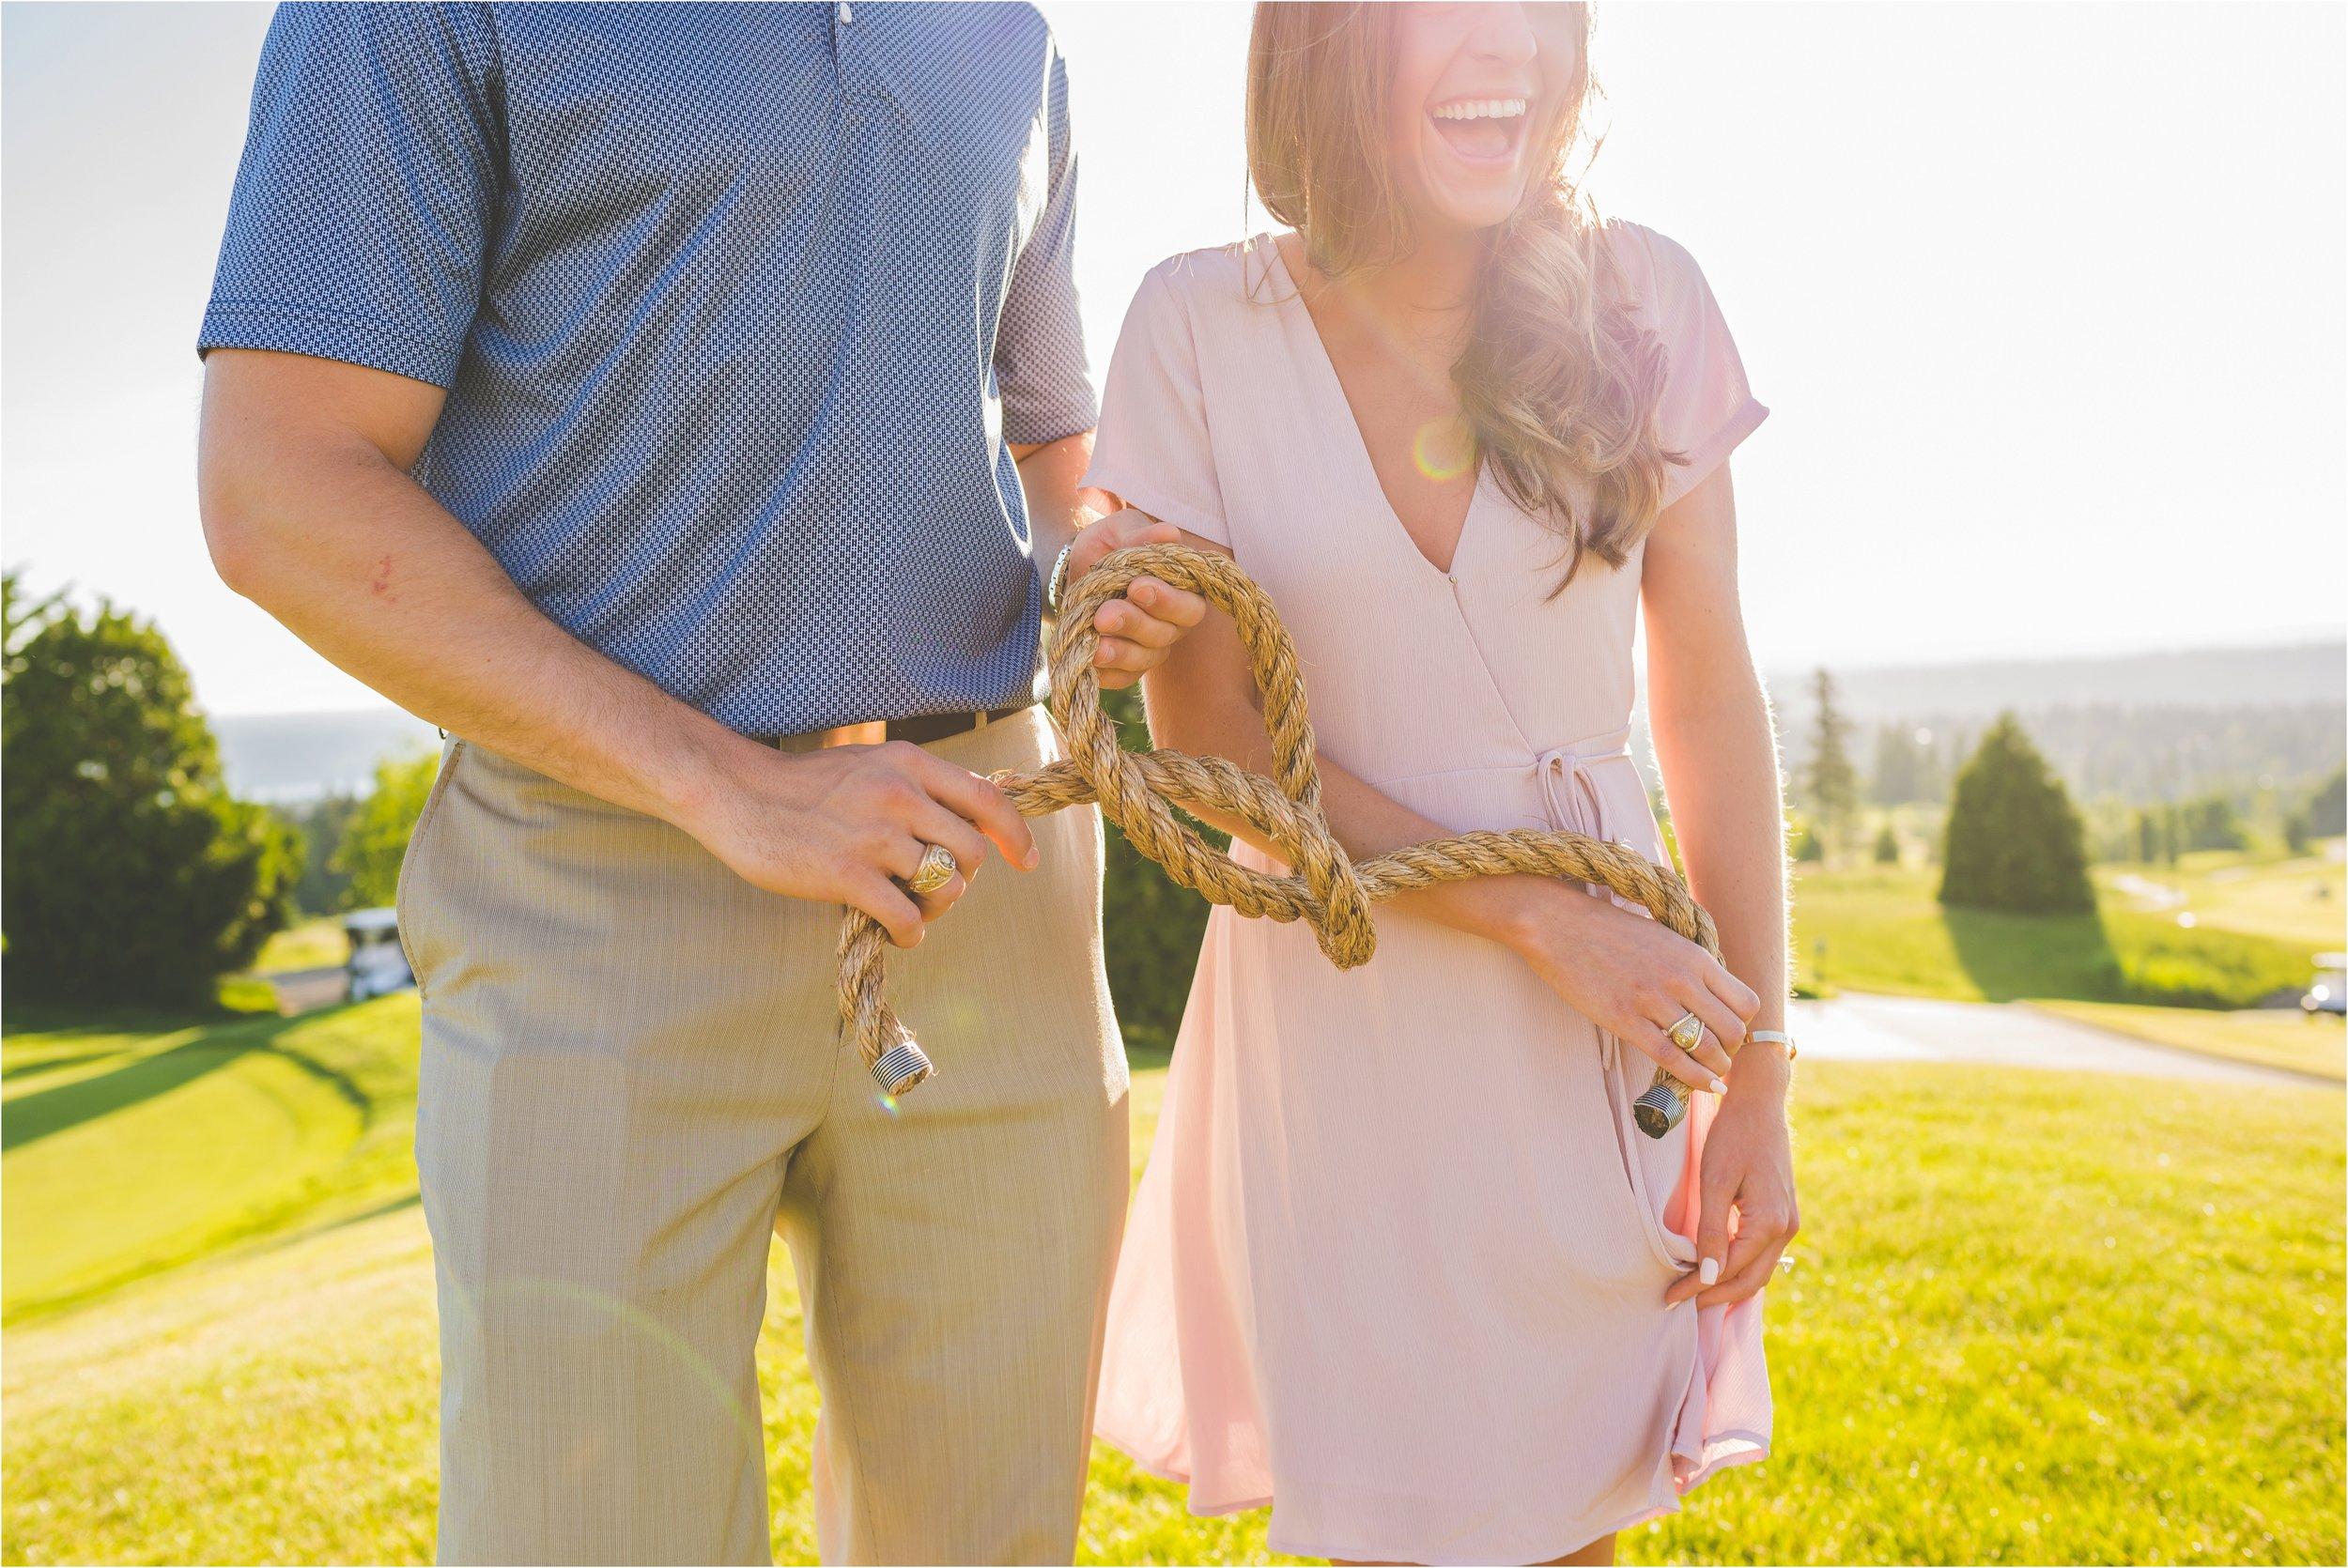 newcastle-golf-club-proposal-jannicka-mayte-seattle-washington-engagement-wedding-photographer_0017.jpg